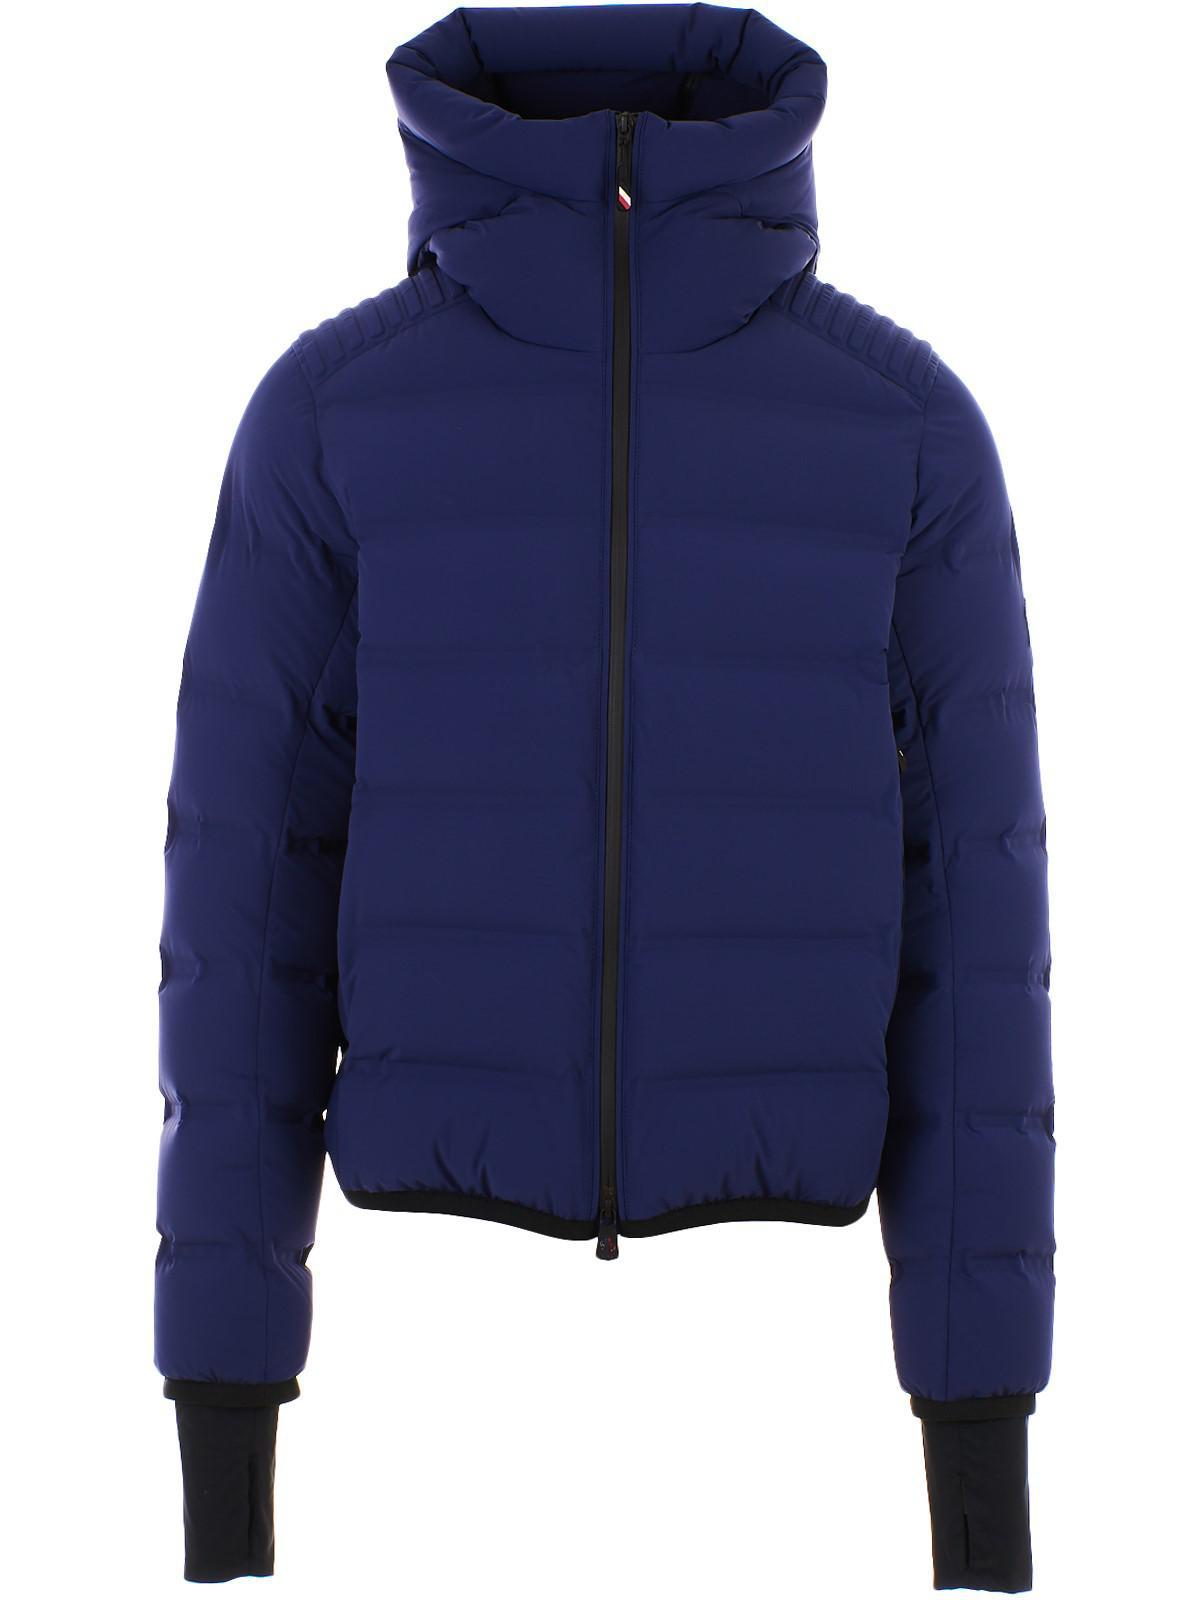 05589e812 Lyst - Moncler Blue Lagorai Down Jacket in Blue for Men